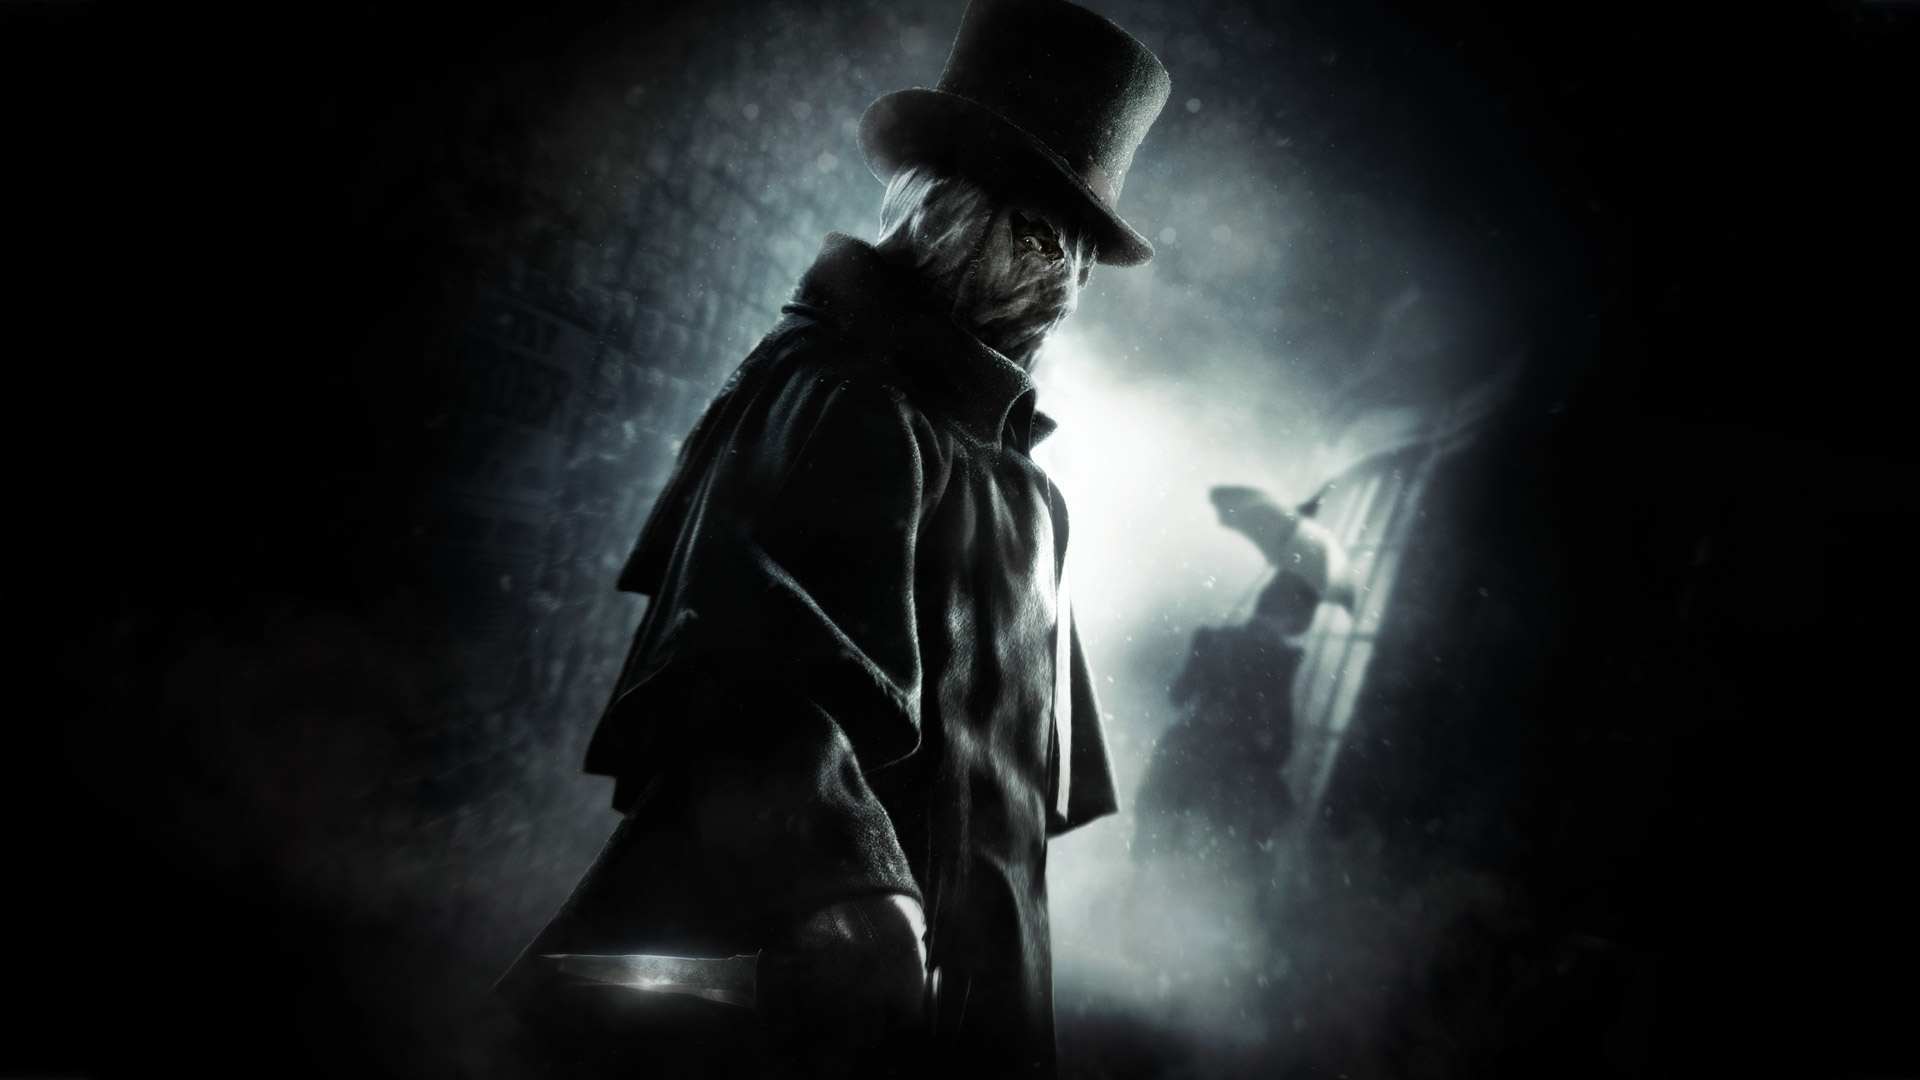 Assasins Creed Syndicate wallpaper 3